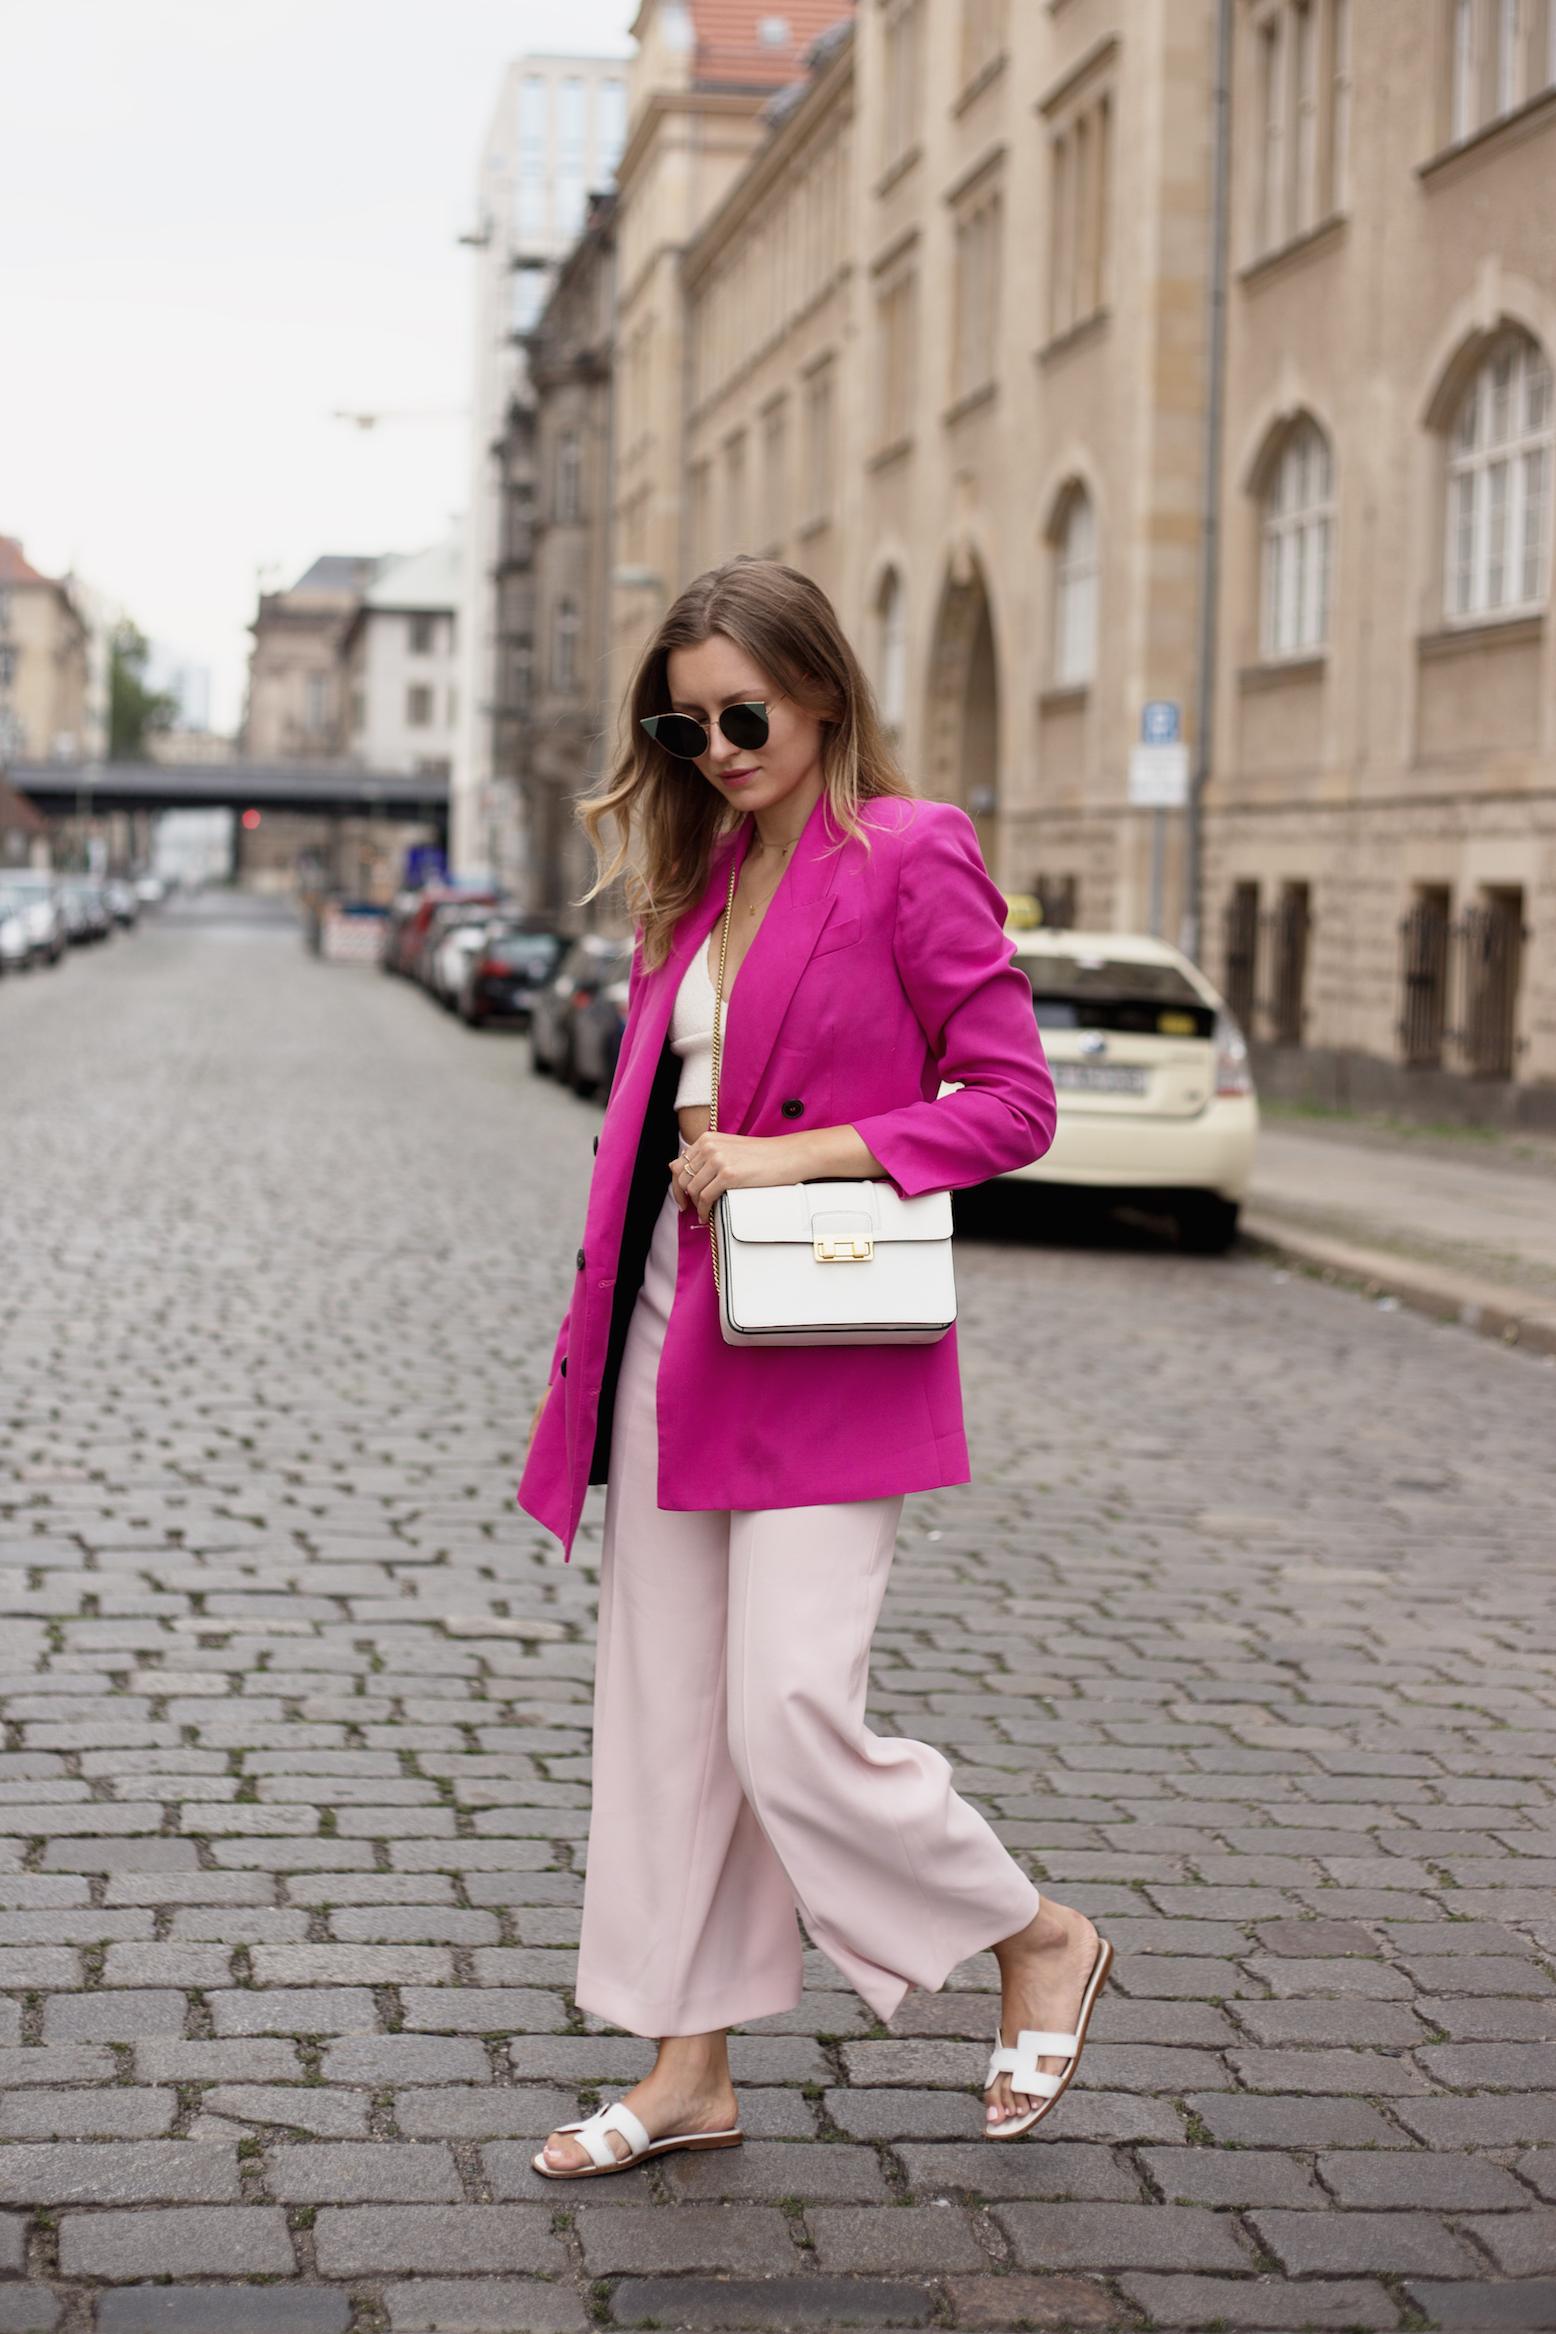 fendi-lei-sunglasses-hermes-oran-livia-auer-IMG_9378